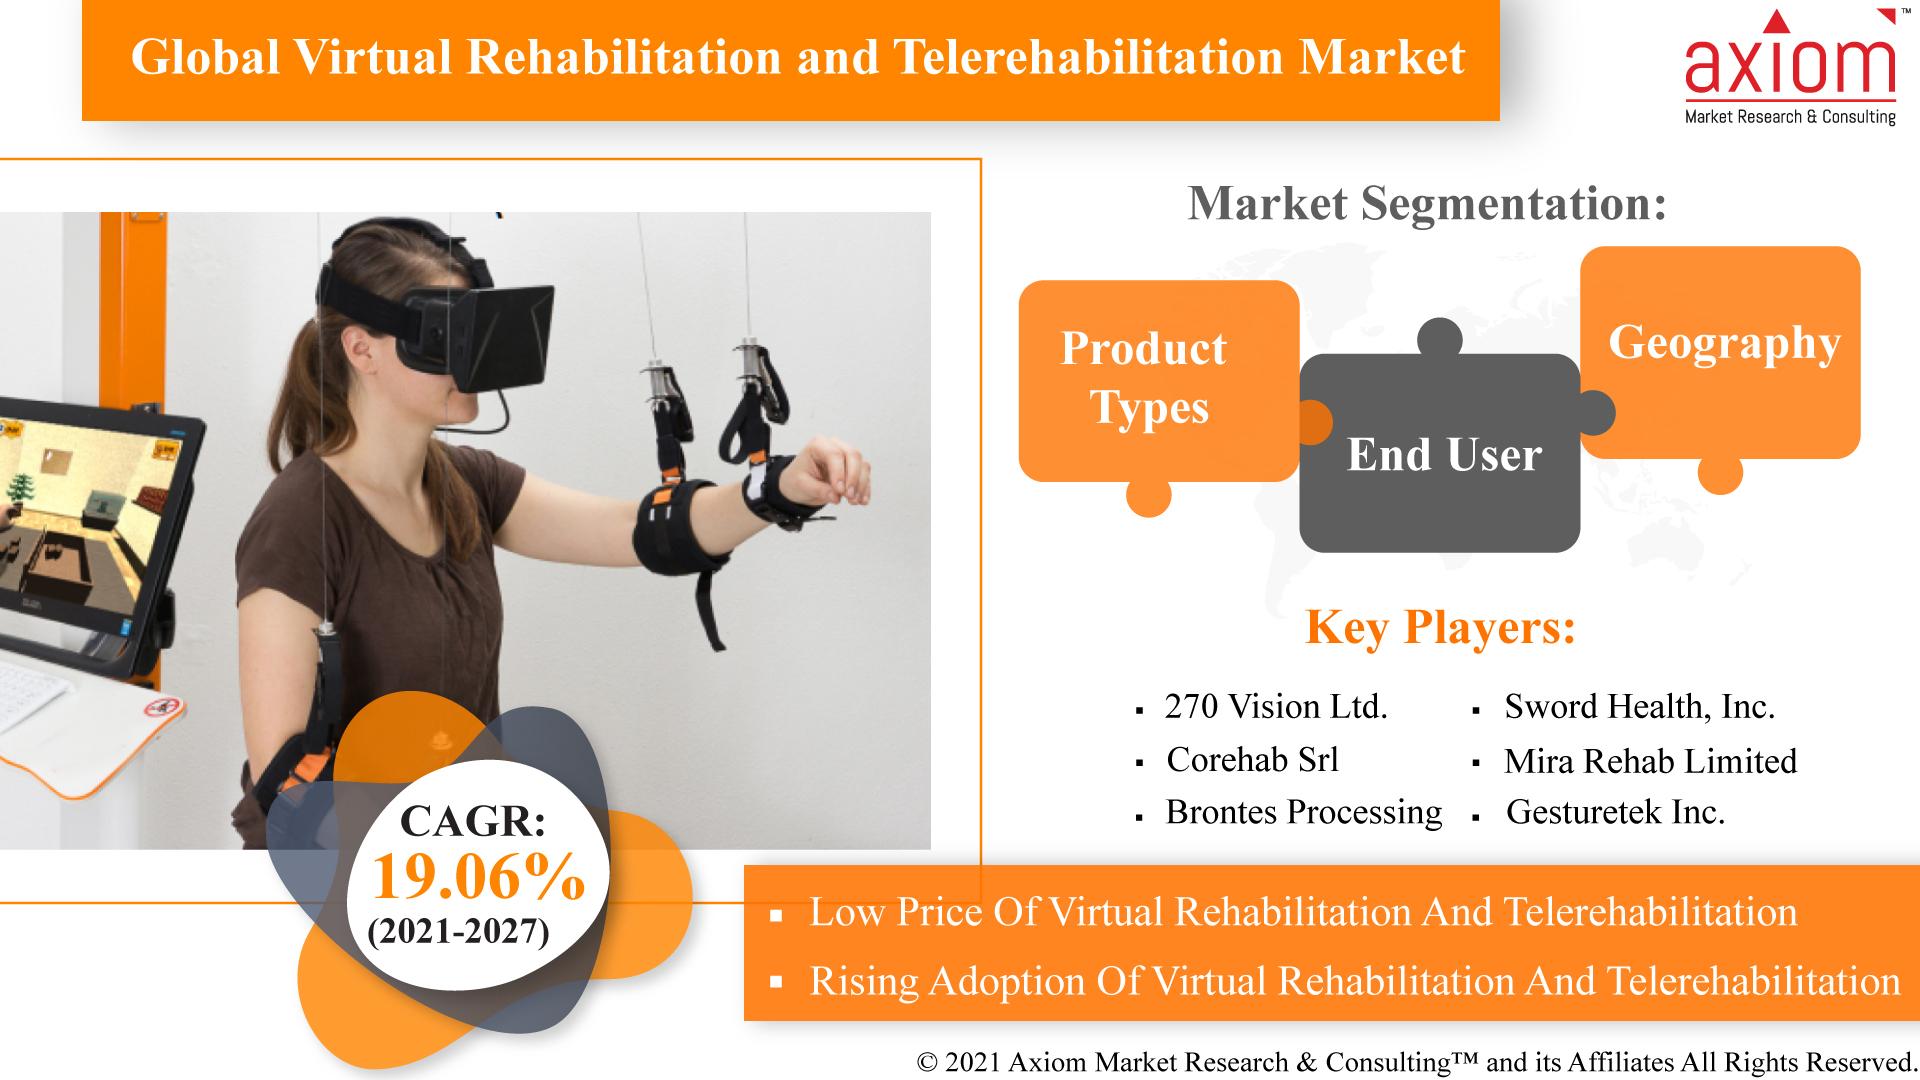 Global-Virtual-Rehabilitation-and-Telerehabilitation-Market